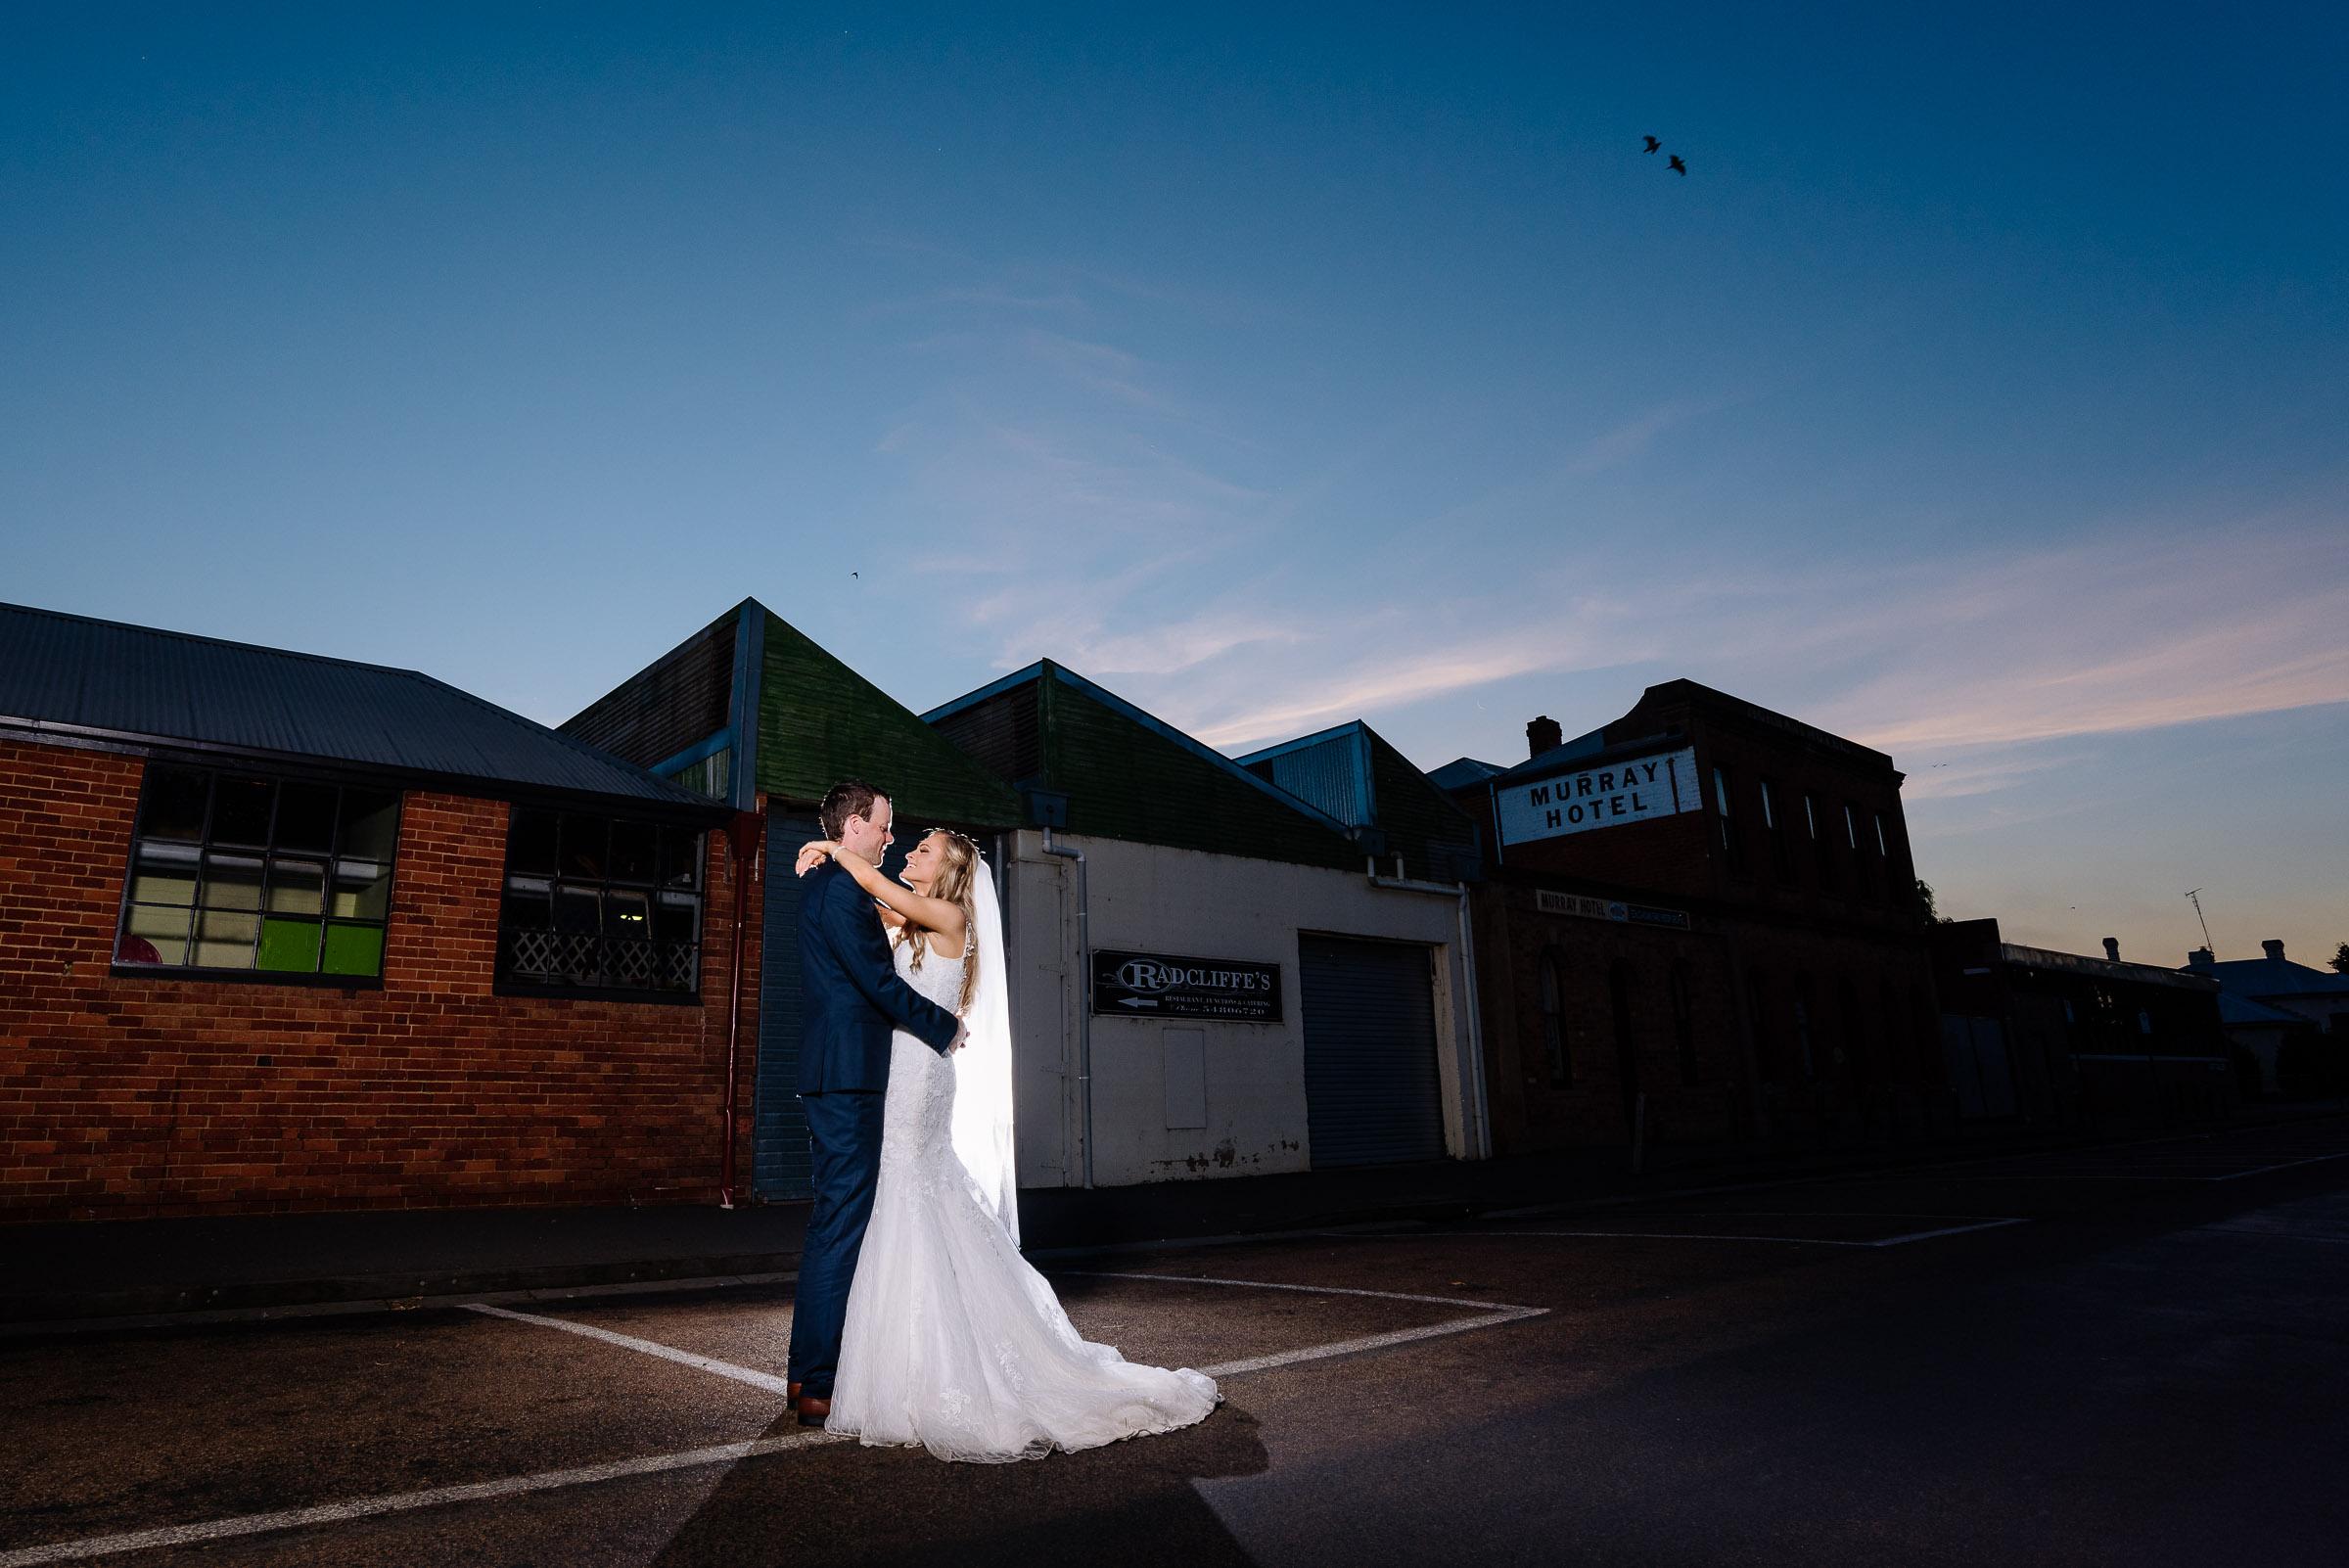 Sunset Wedding Photography Port of Echuca -  Radcliffes Wedding Photographer Echuca